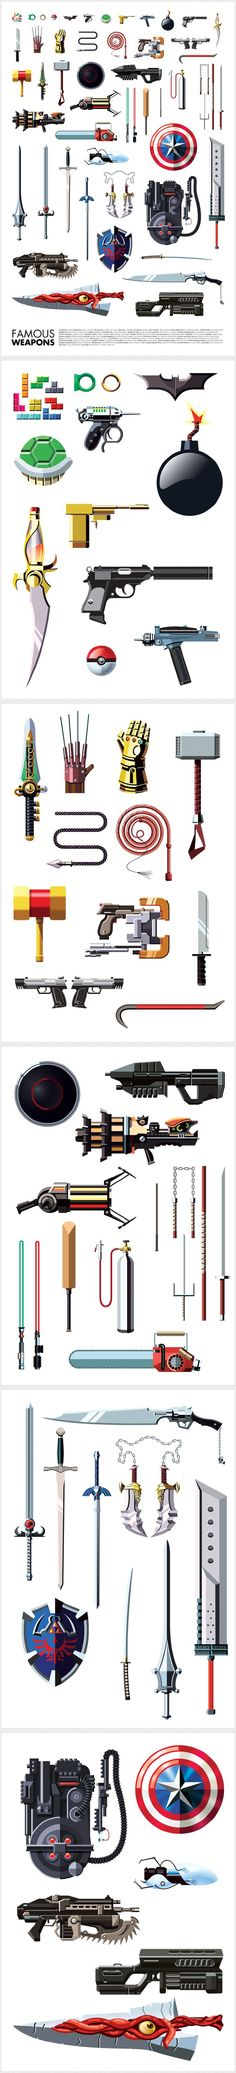 Sensacional colección de armas famosas de comic books, videogames, películas y series de TV